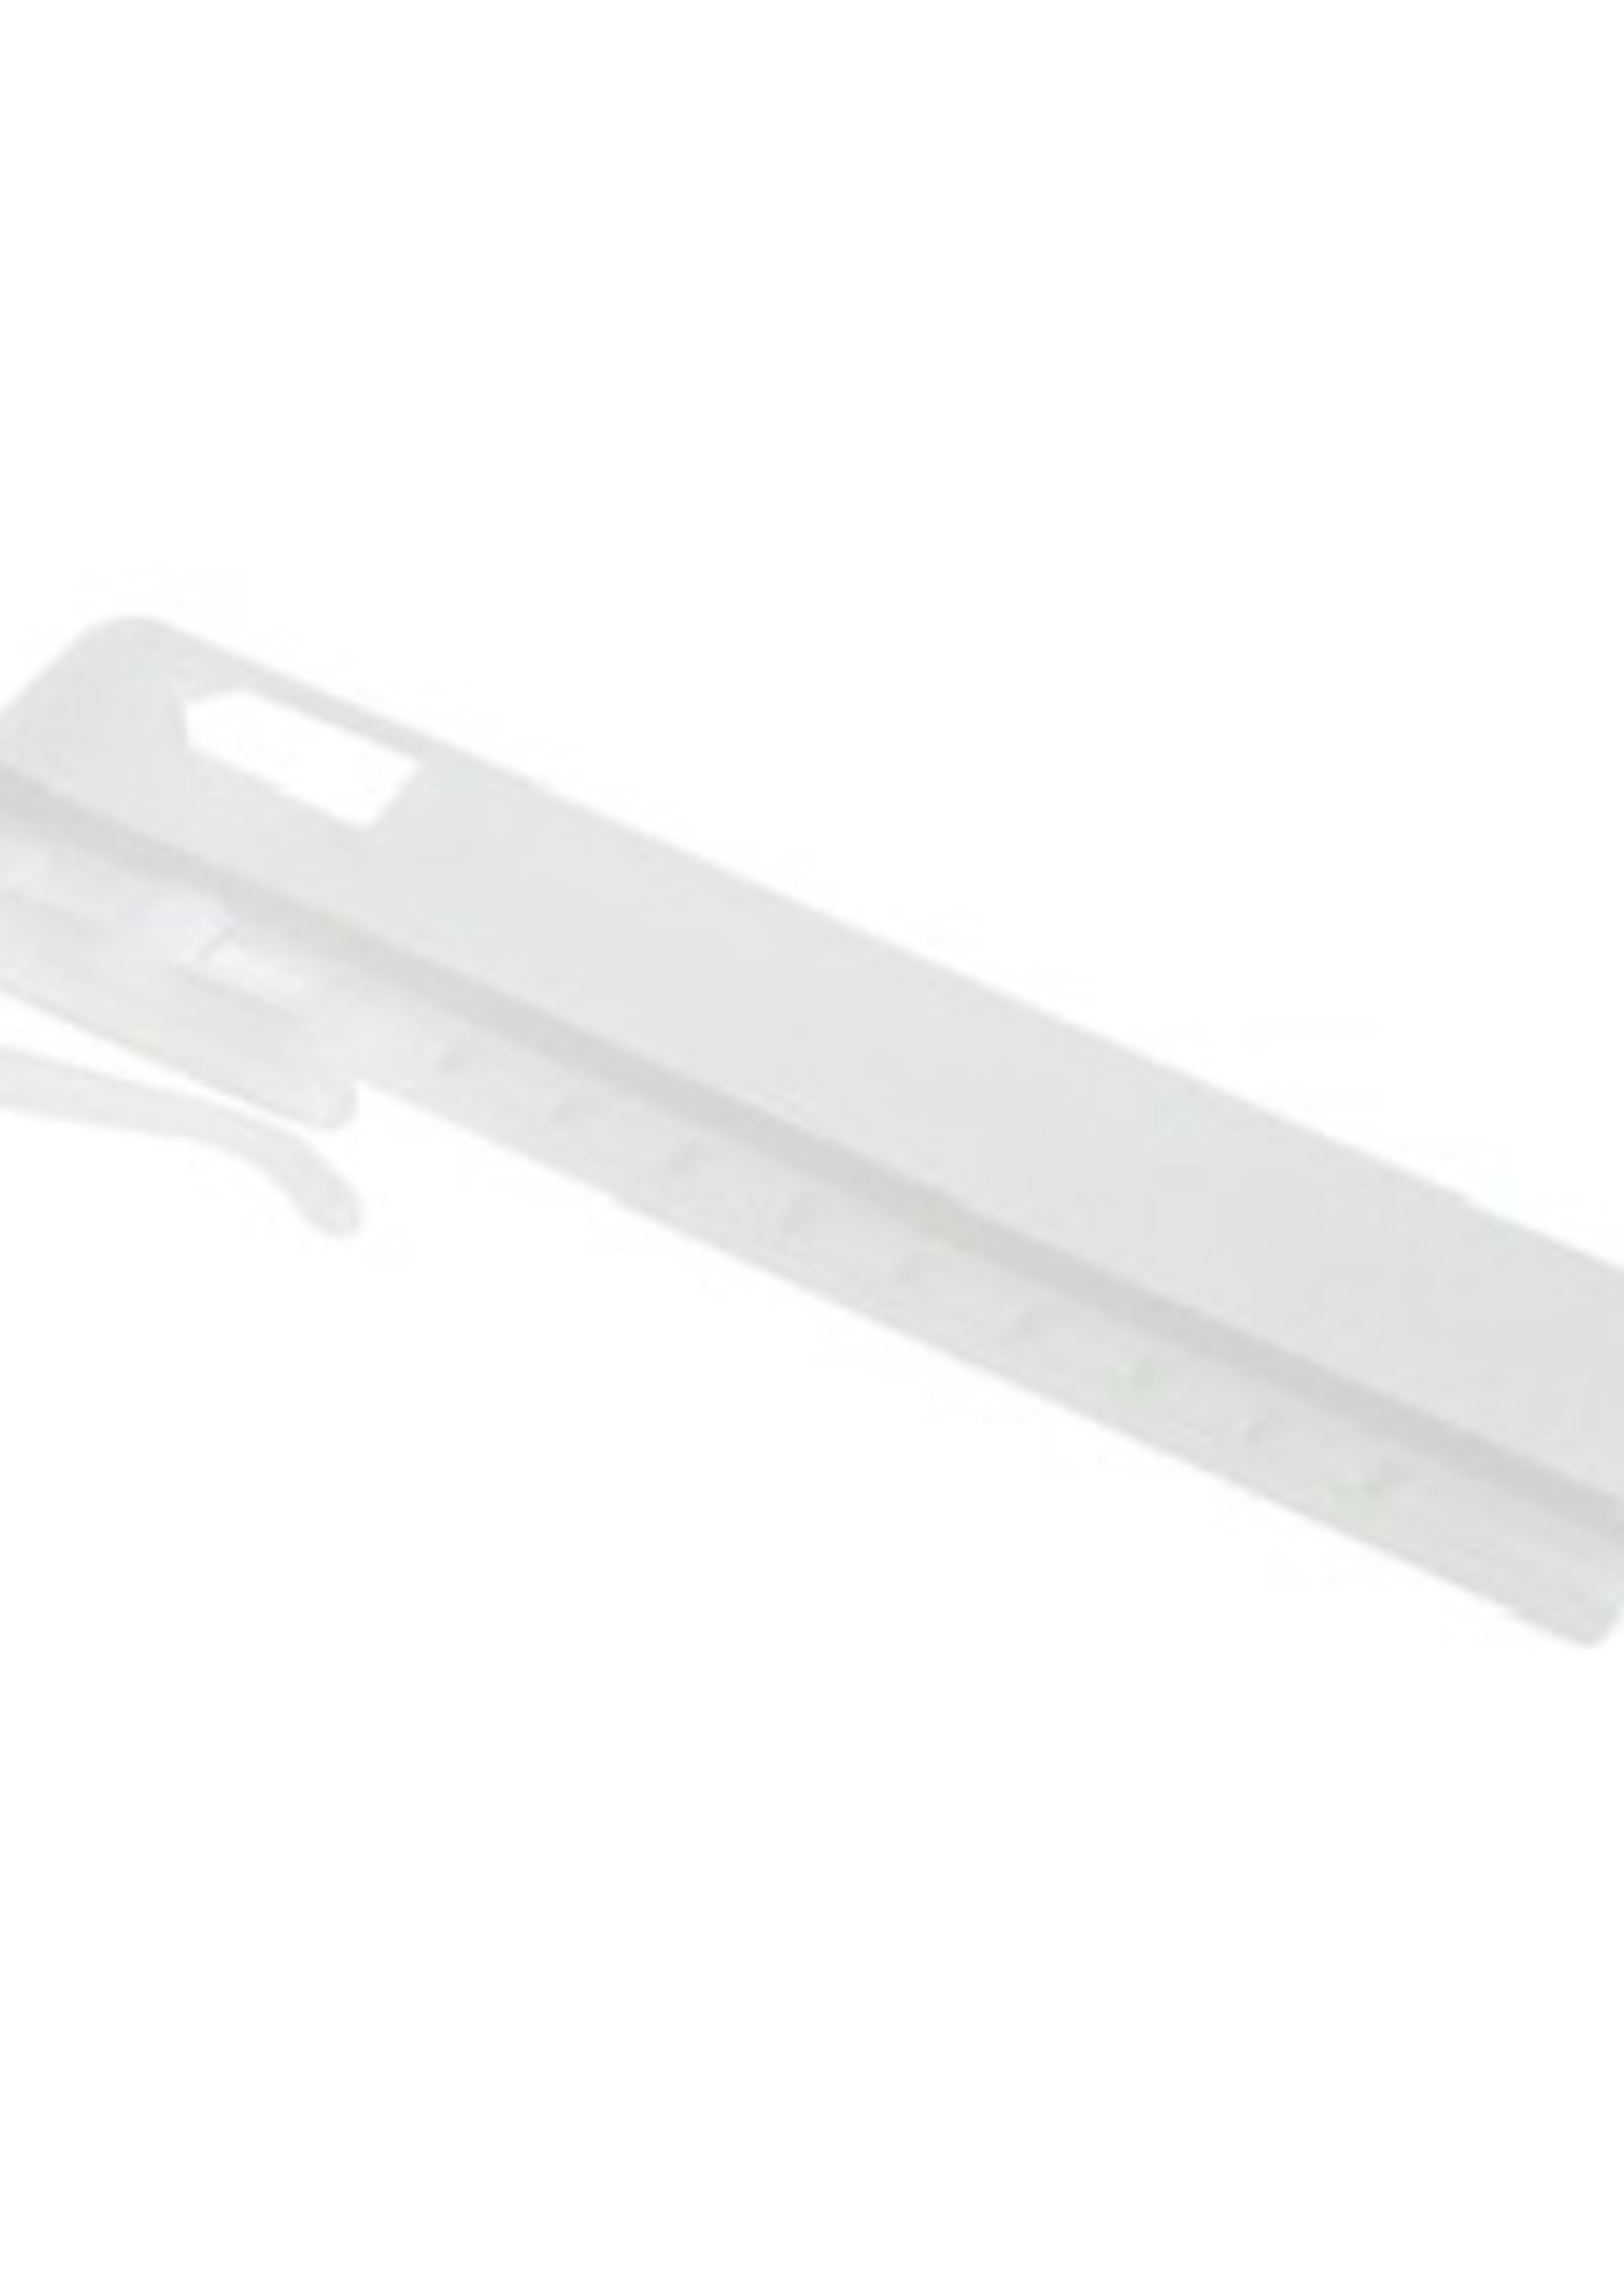 Microflex Innaai verstelbare gordijnhaak 5cm  verpakt per 100 stuks